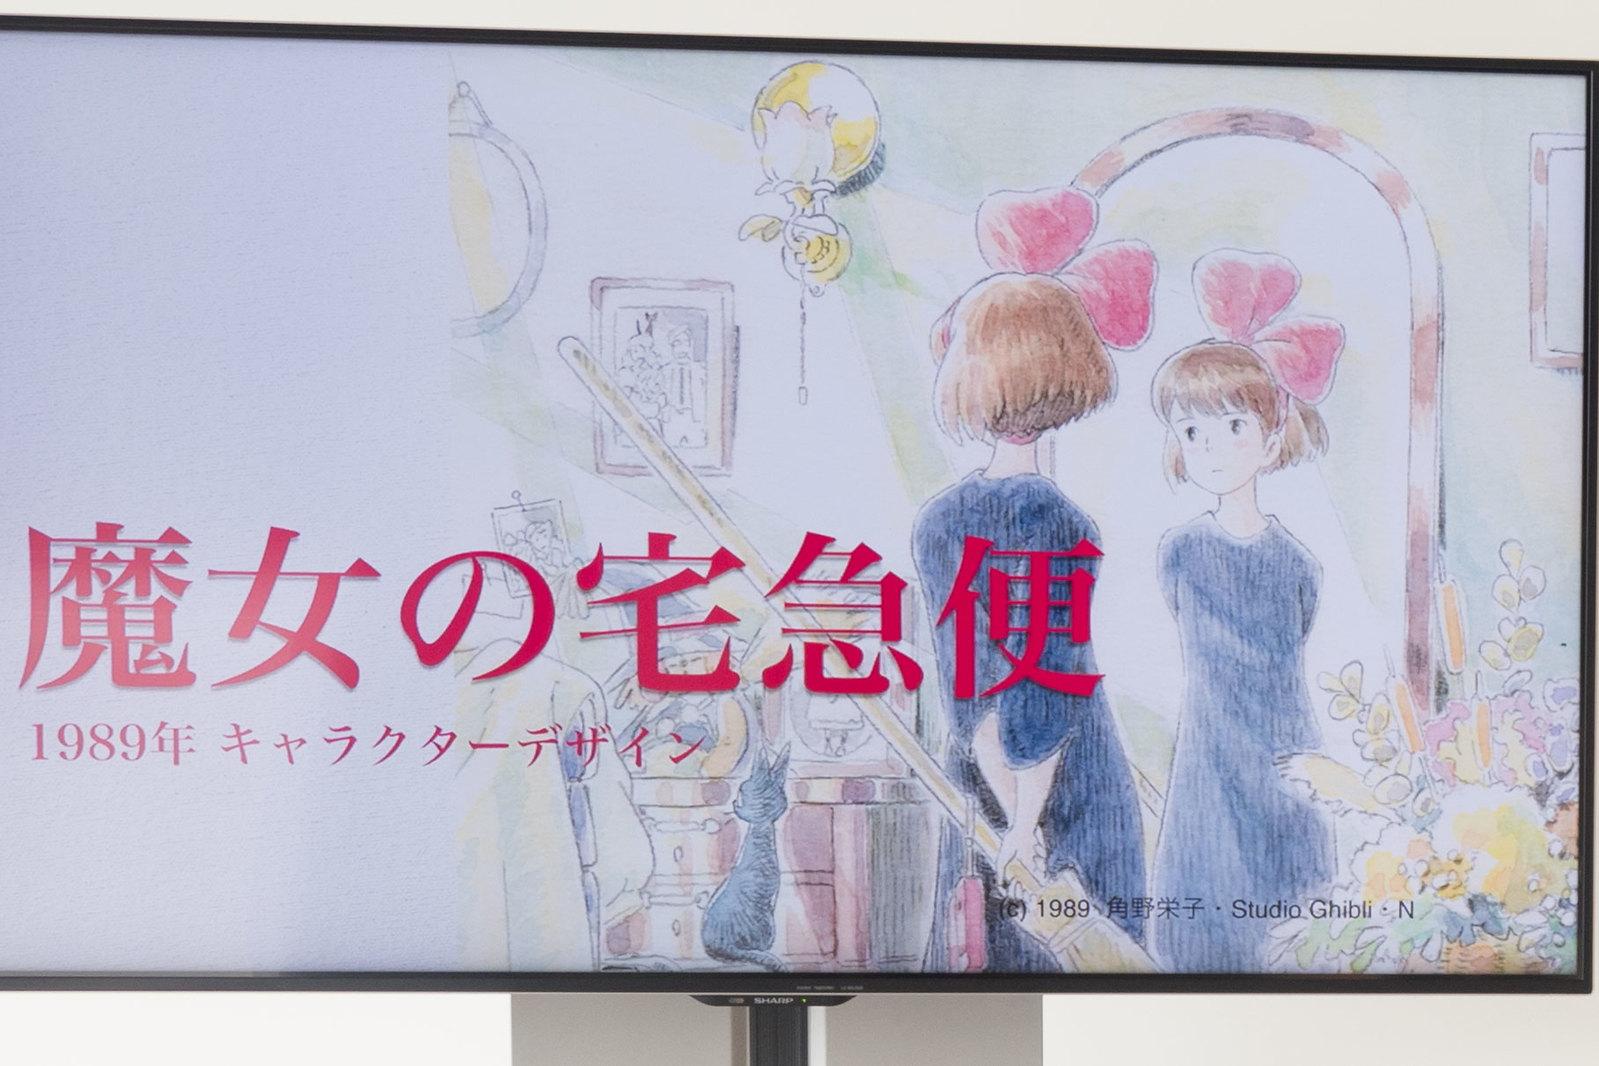 Ghibli_katsuyakondo-6